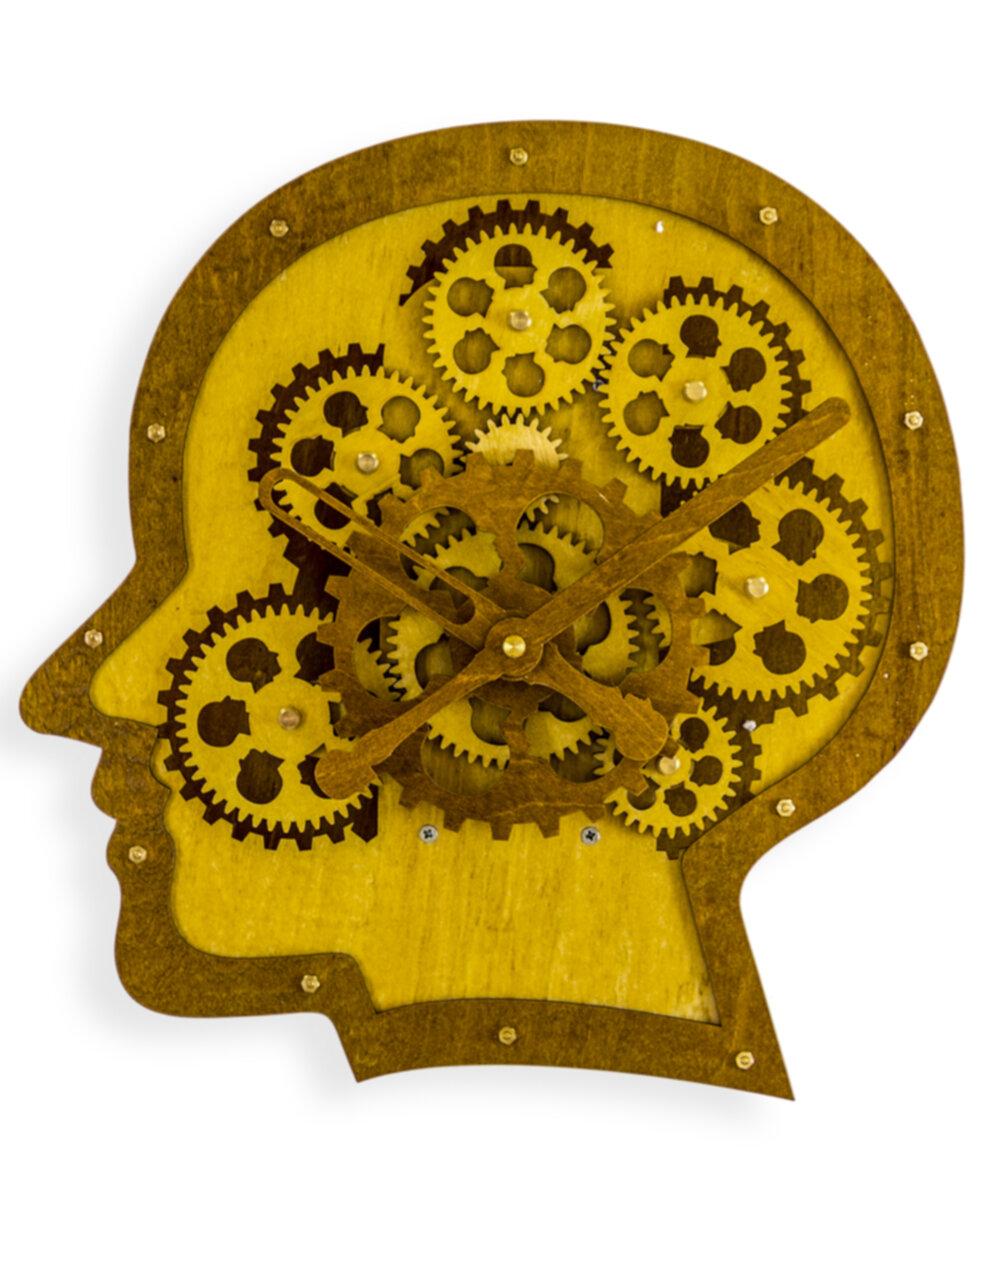 Wooden Head Moving Gears Wall Clock